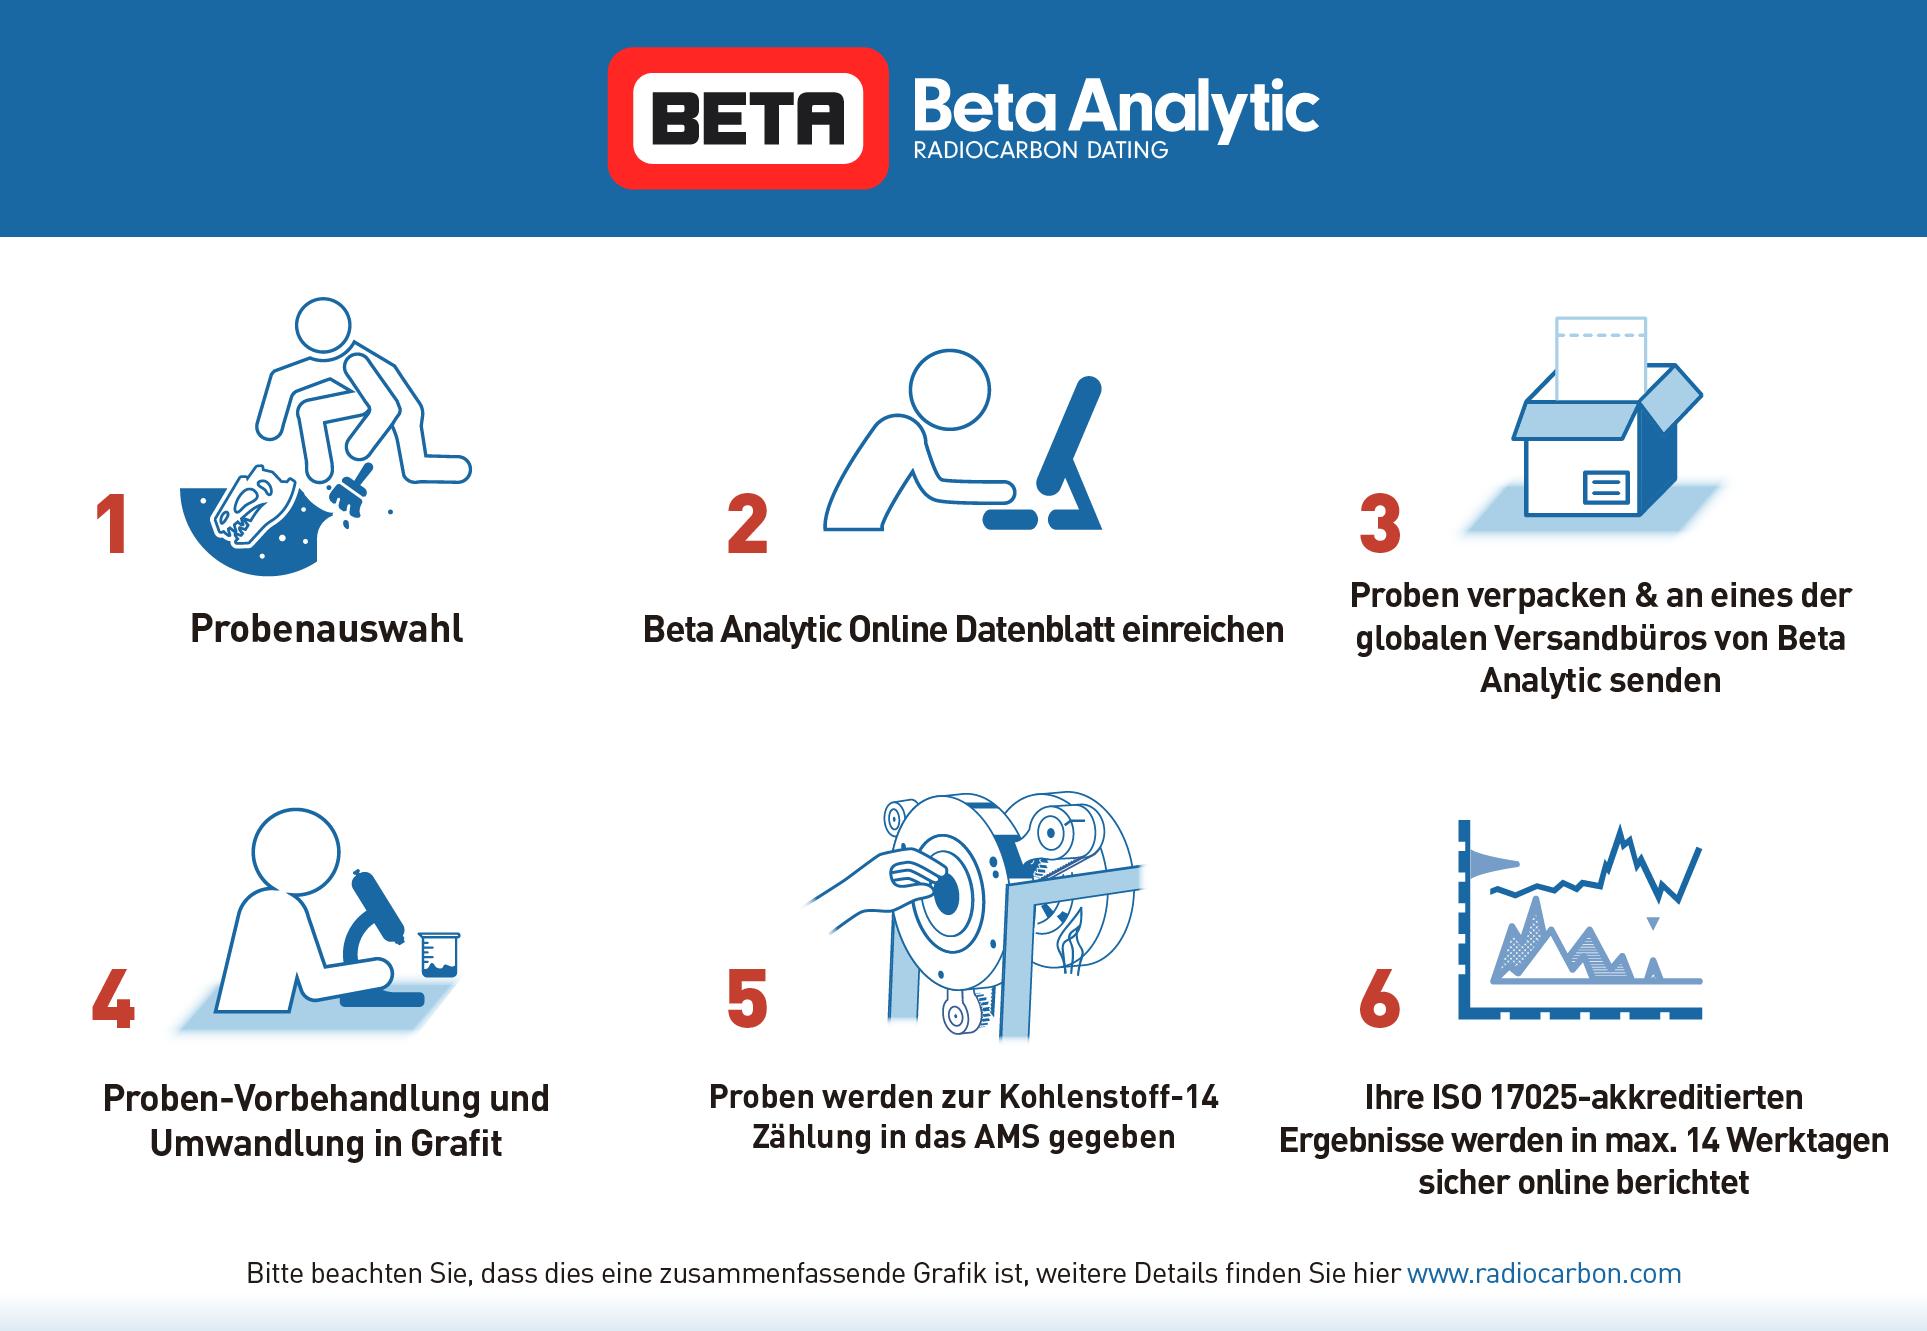 Beta Analytic Radiocarbon Dating Samples